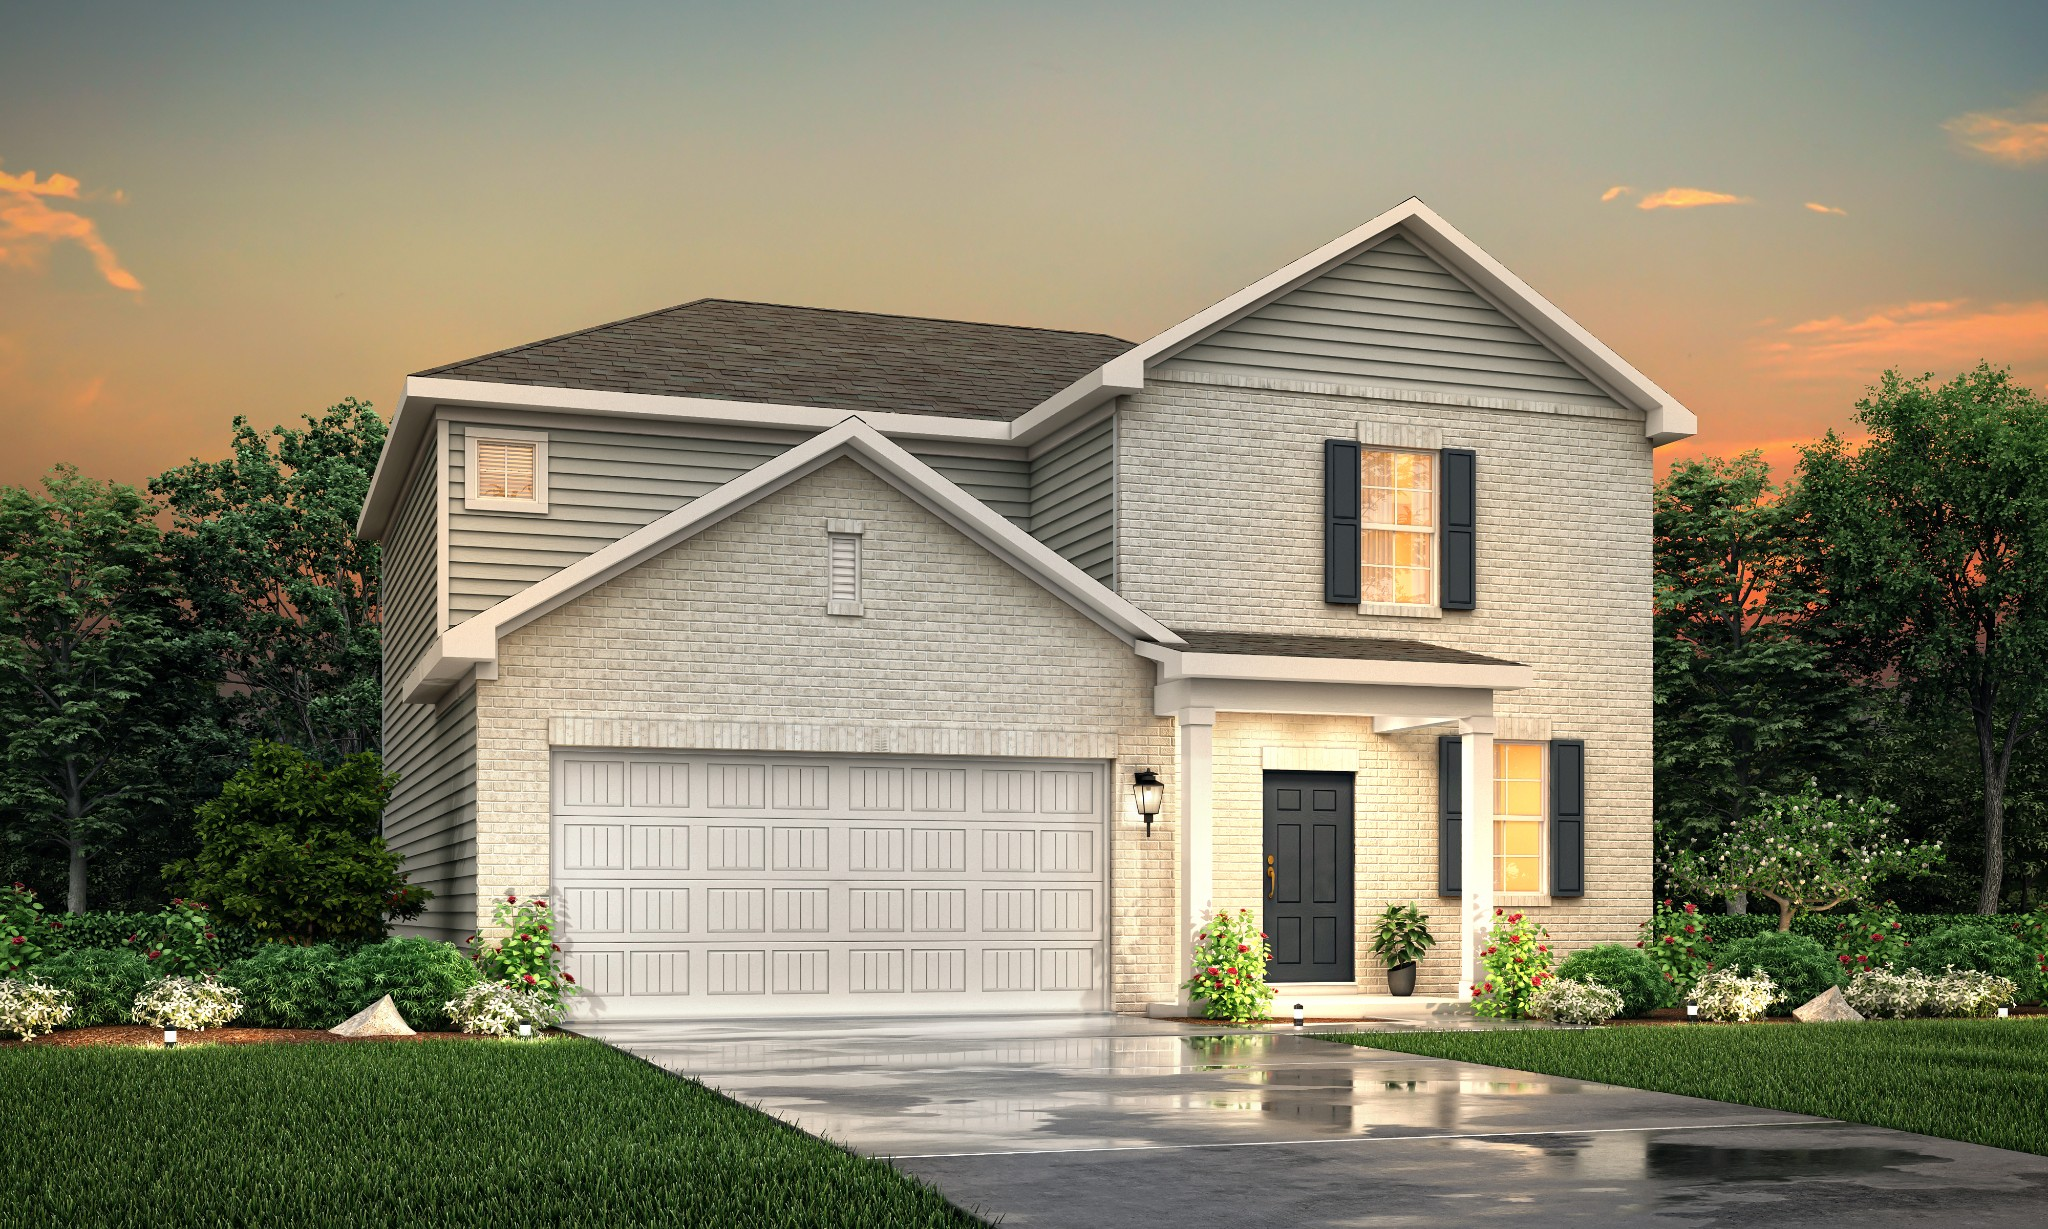 803 Amberton Dr Lot 152, Smyrna, TN 37167 - Smyrna, TN real estate listing